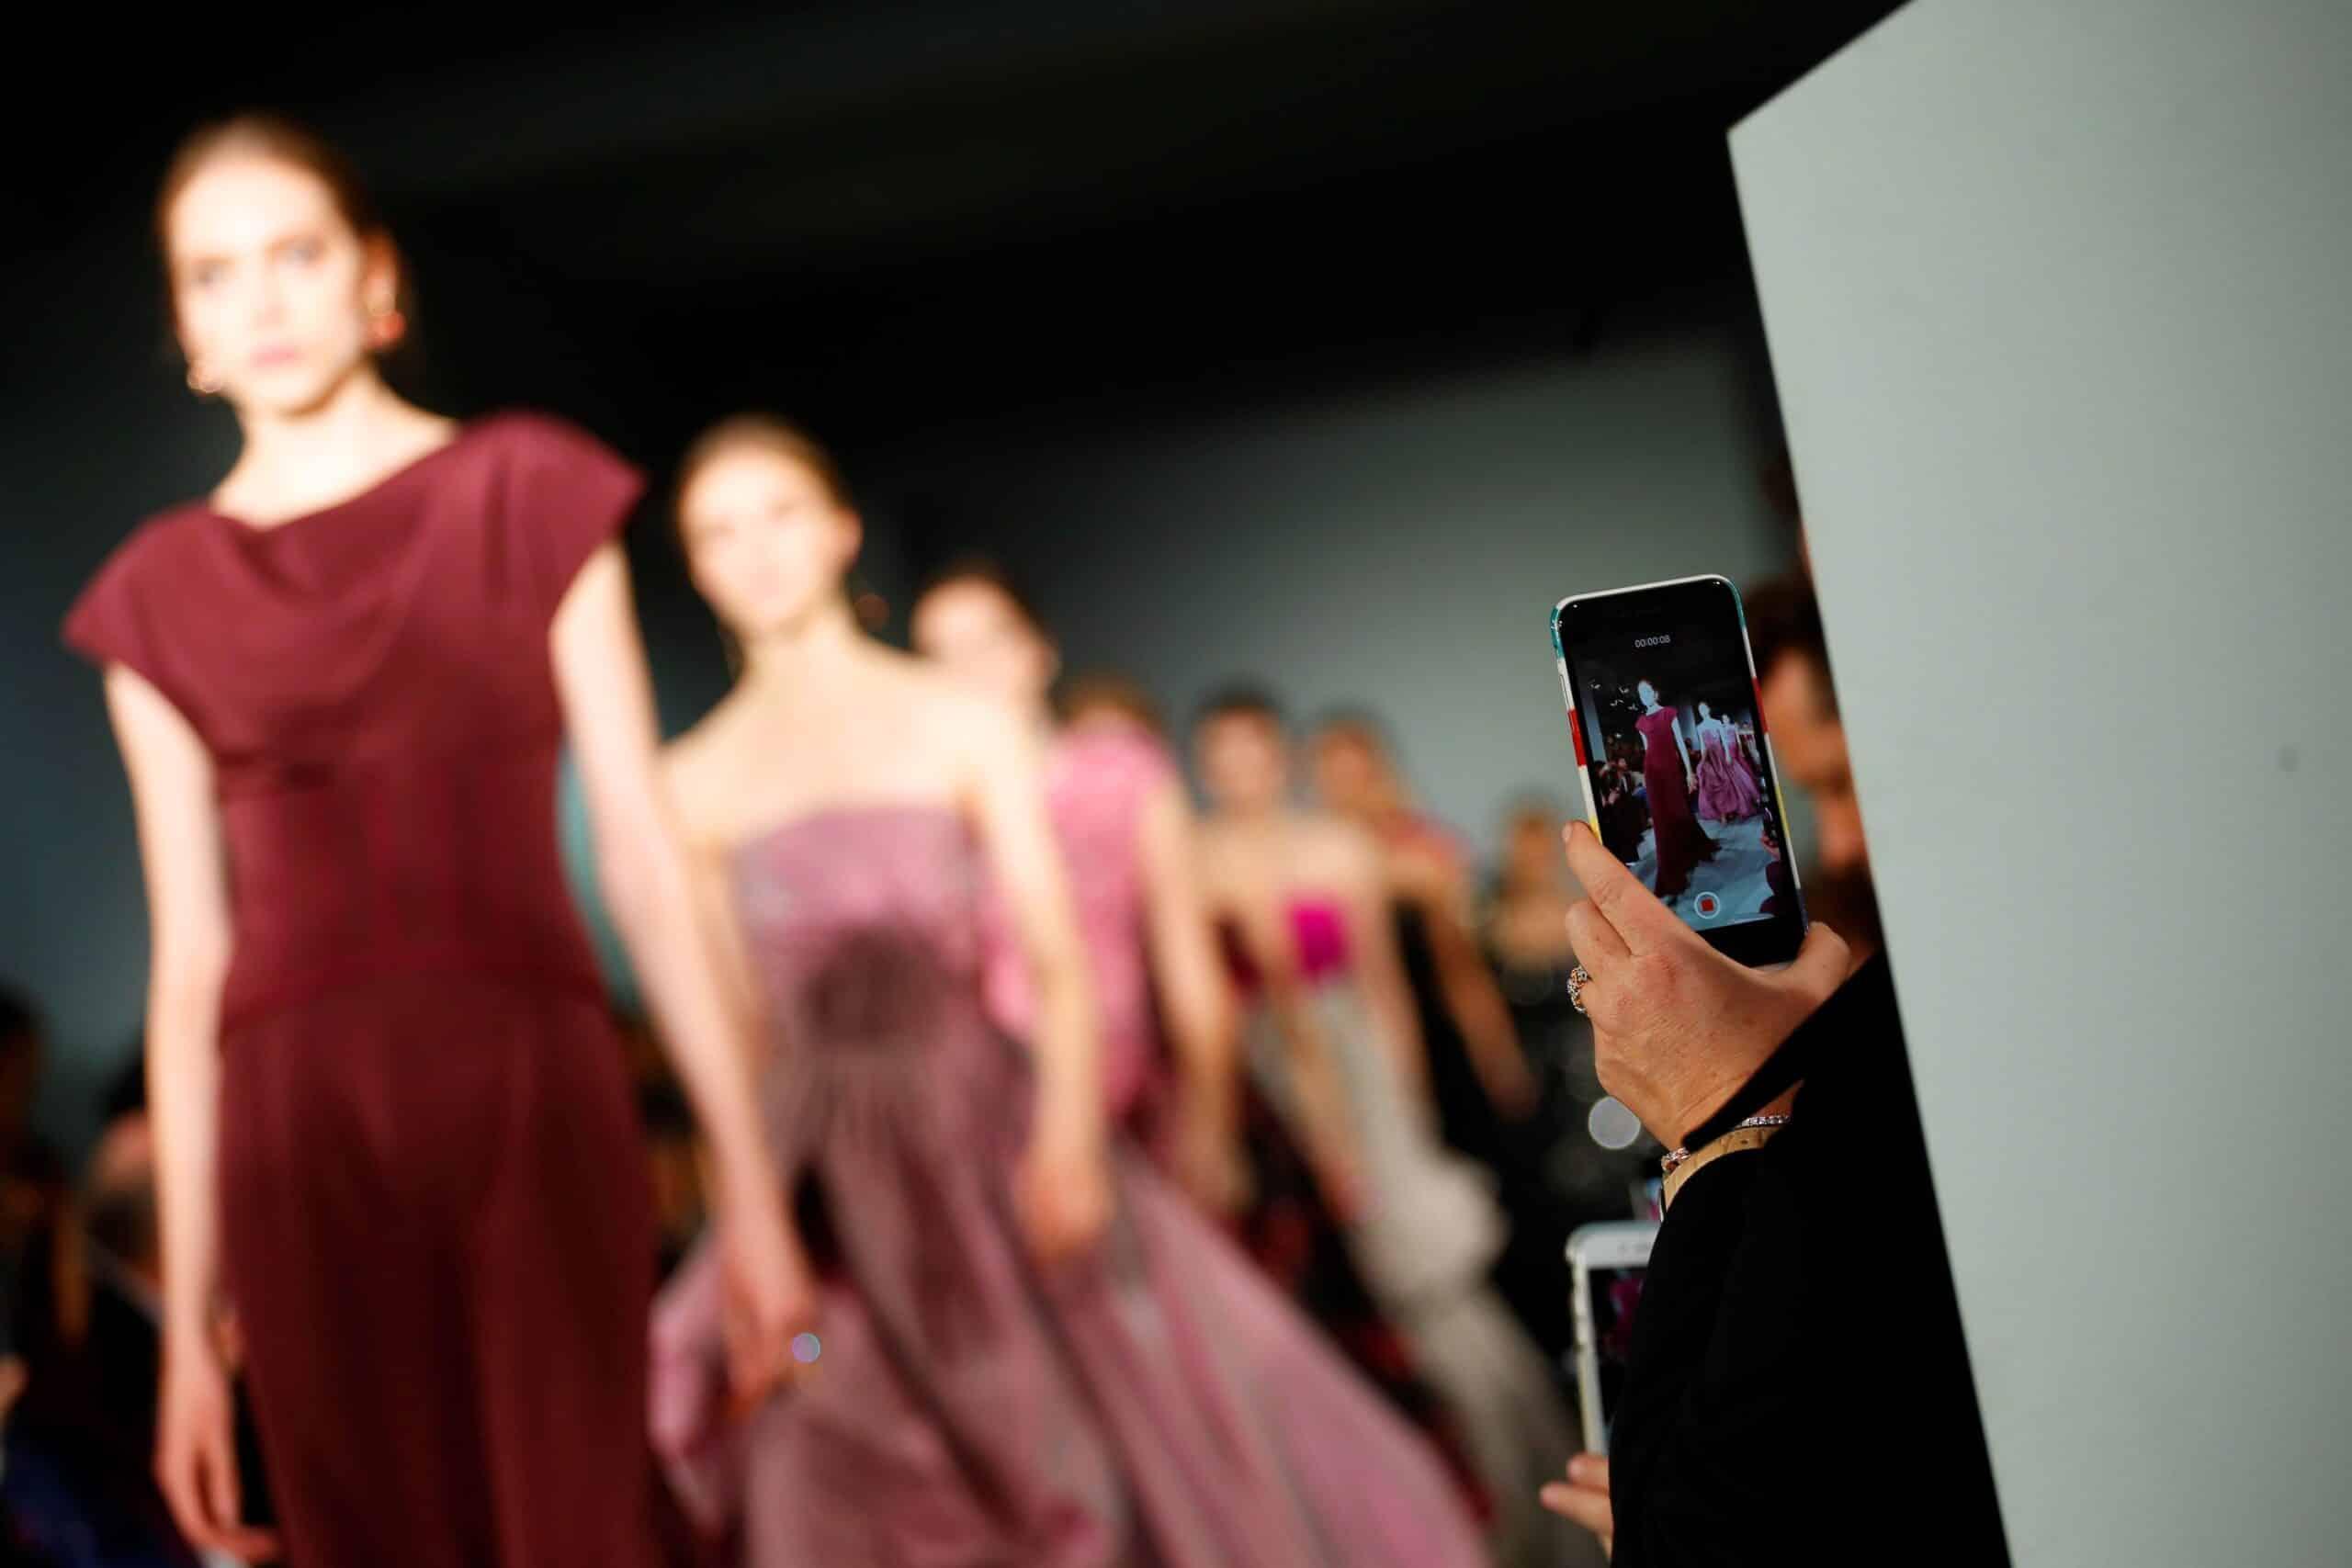 oscar-de-la-renta-formal-gowns-runway-pink-fuchsia-berry-floral-dress-cococozy-vogue